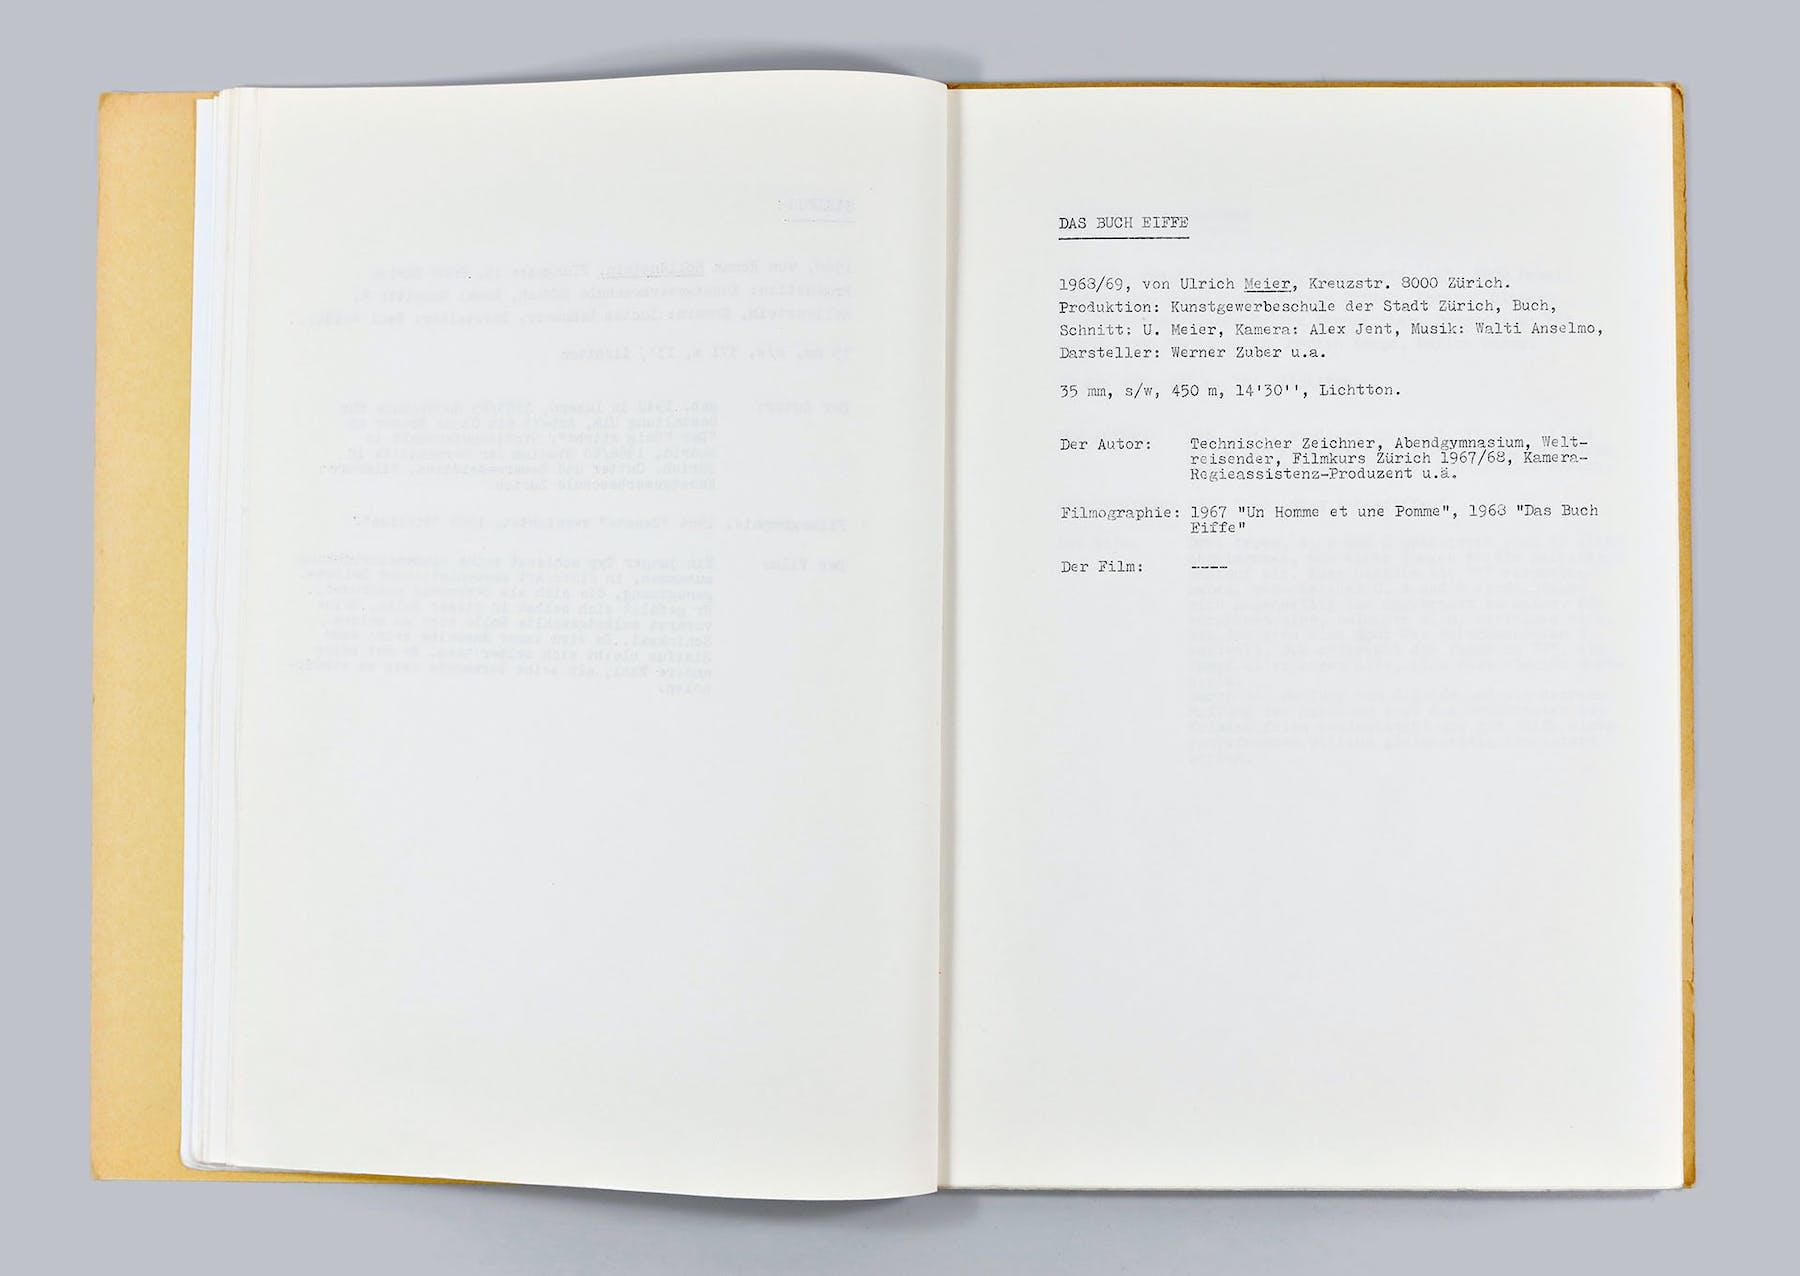 Image 1 de Das Buch Eiffe